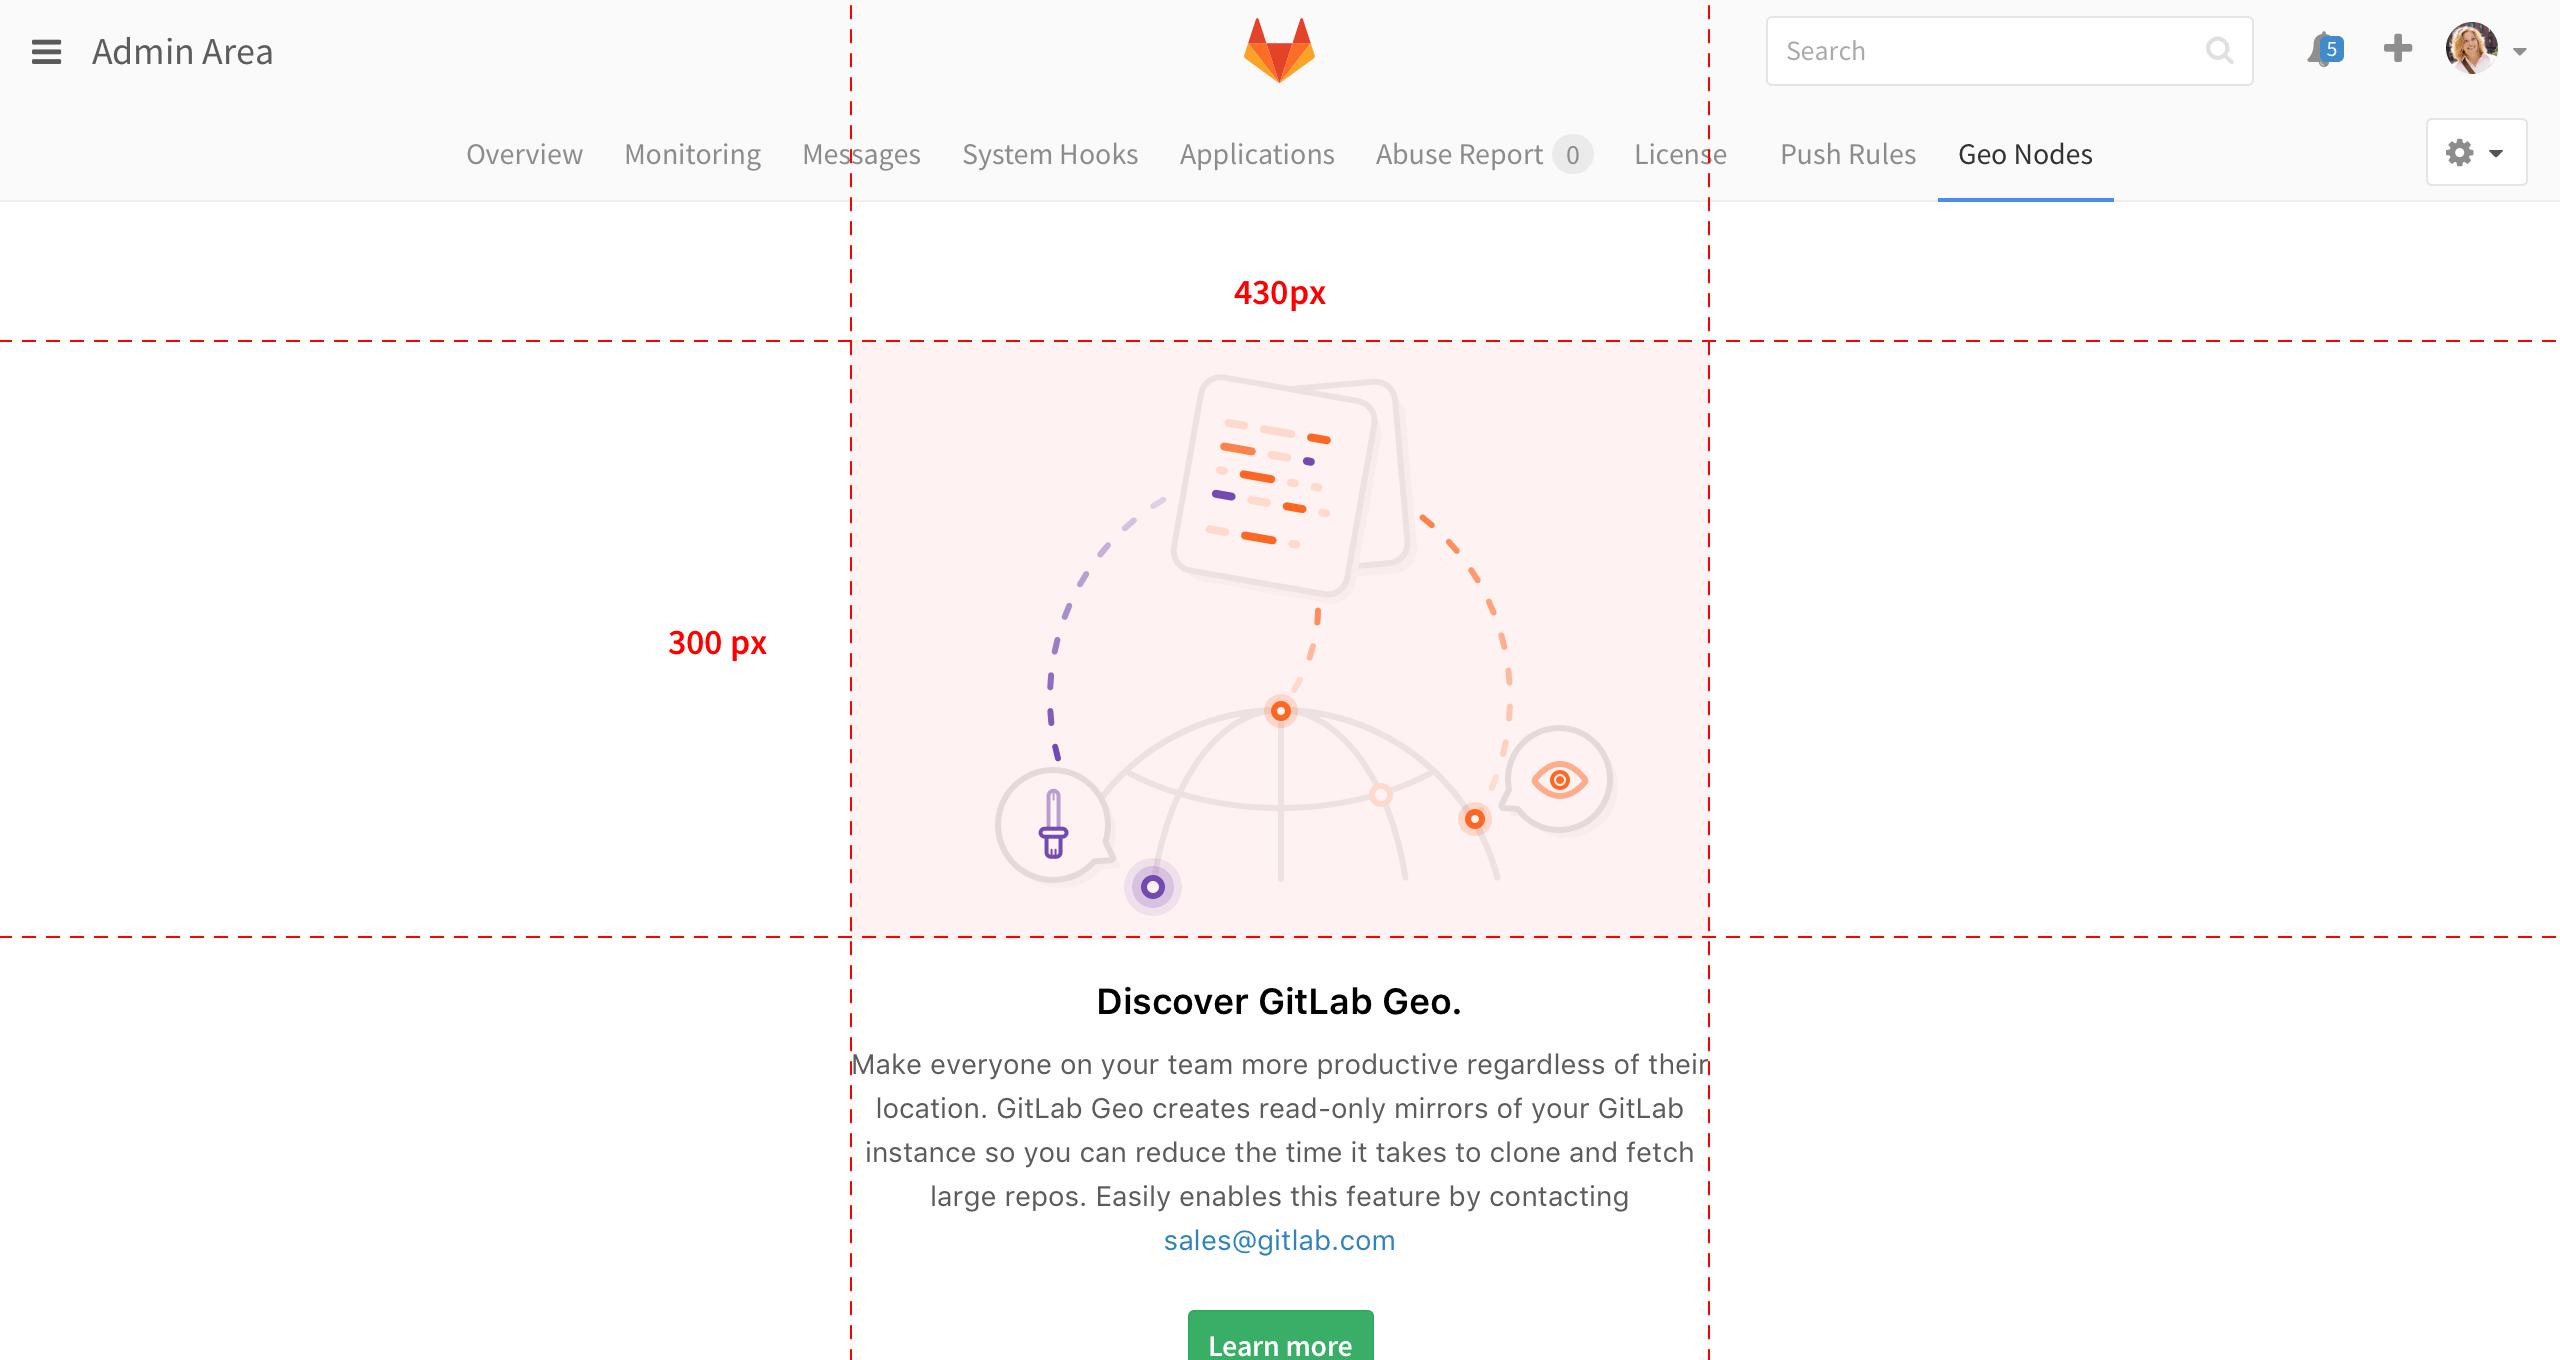 doc/development/ux_guide/img/illustration-size-large-vertical.png